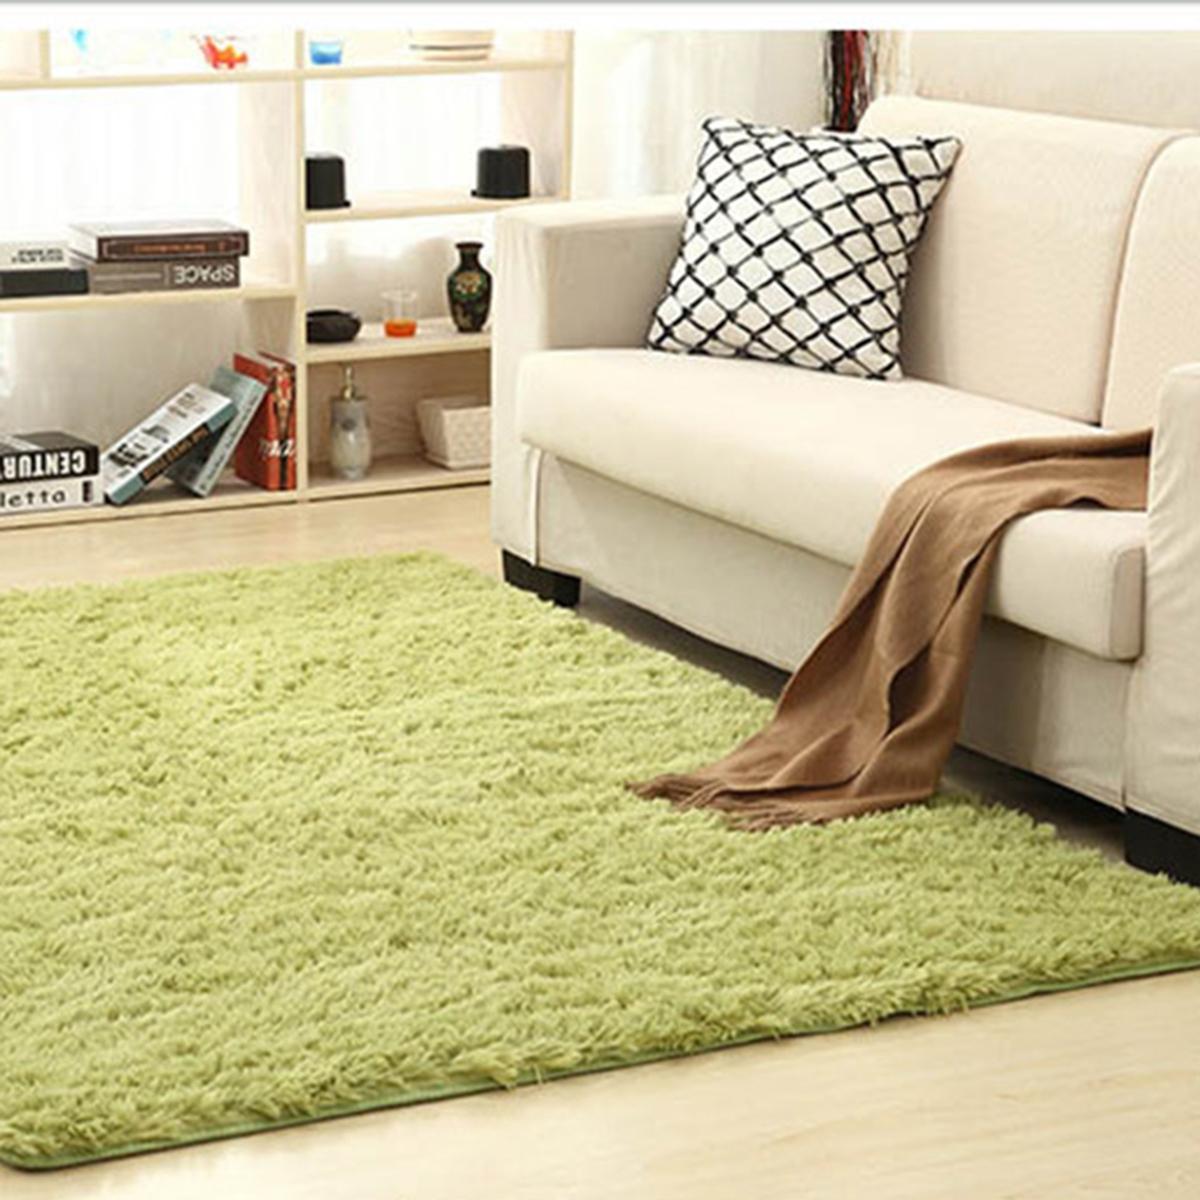 soft shaggy carpet for living room european home warm plush floor rugs fluffy mats kids room - Carpet For Living Room